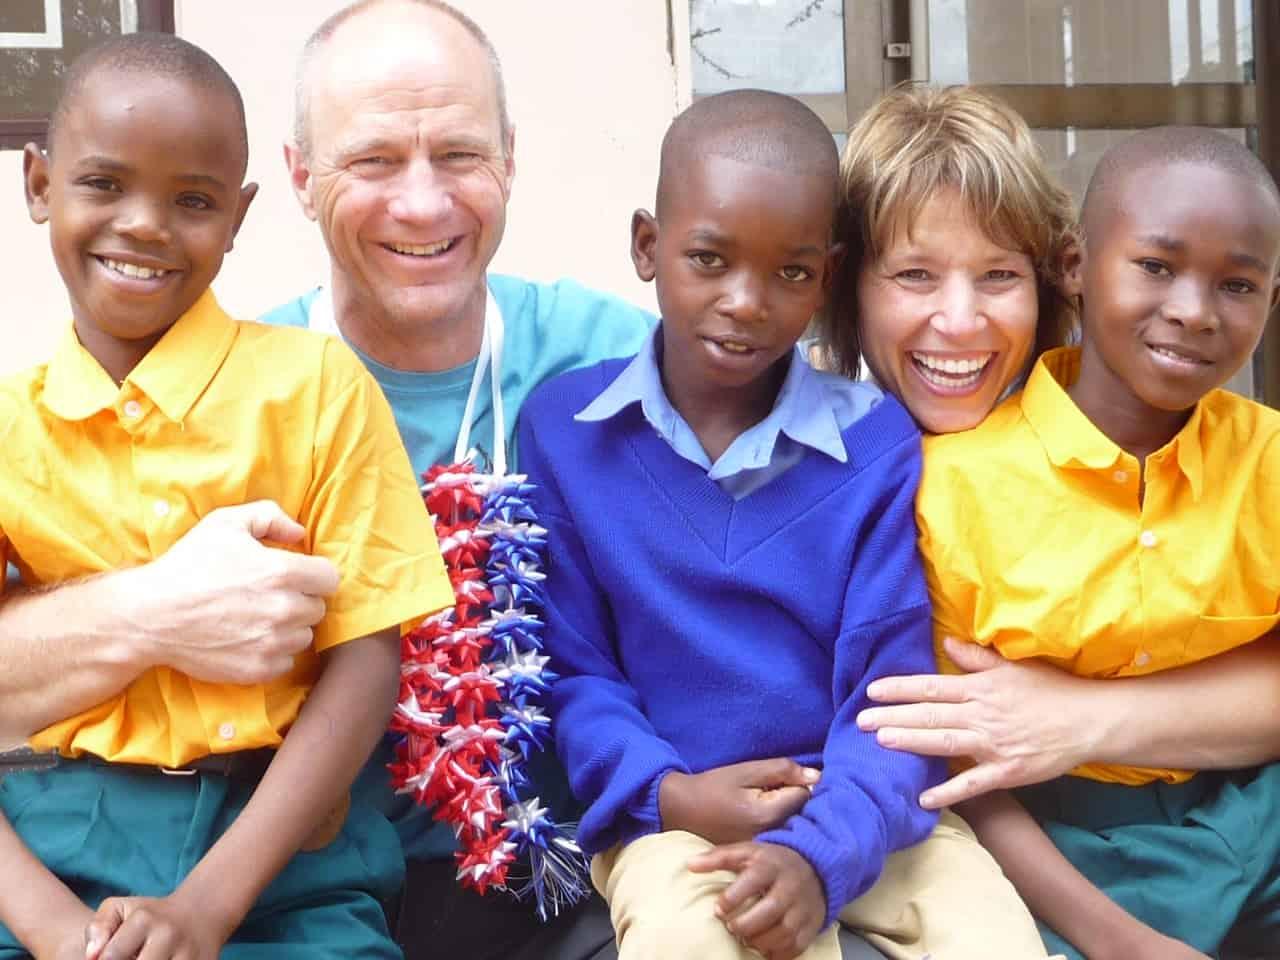 A man and woman hug three children in school uniforms